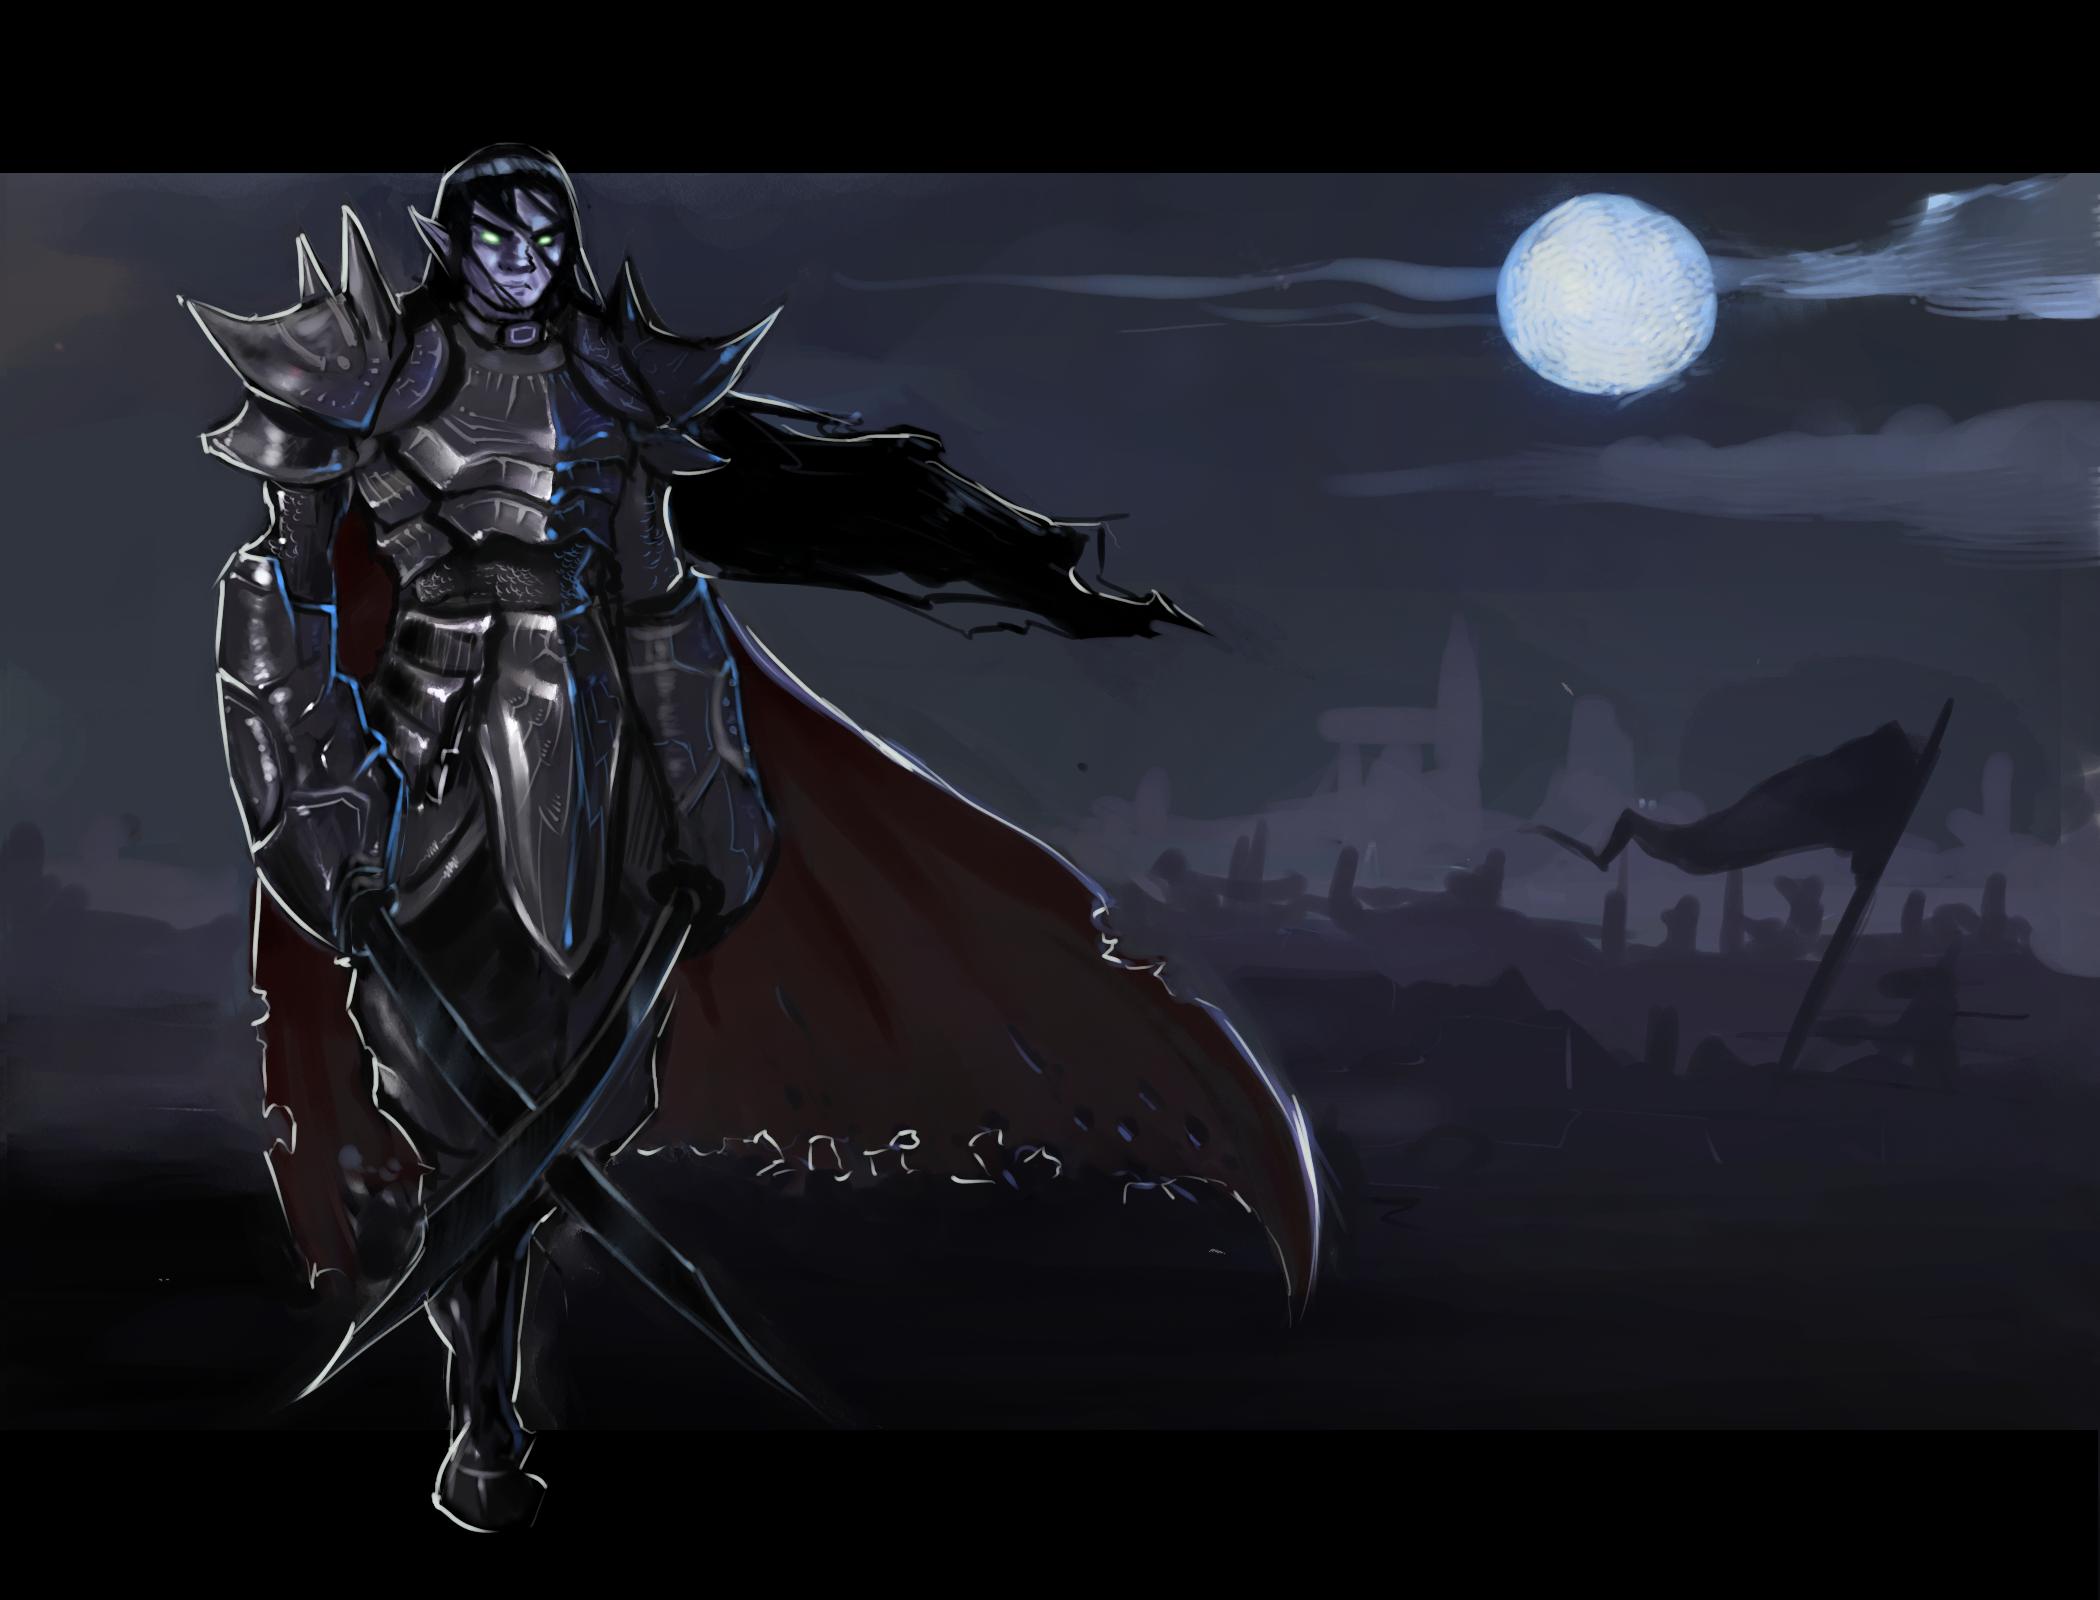 Knight (contest entry) by Gjergji-zhuka